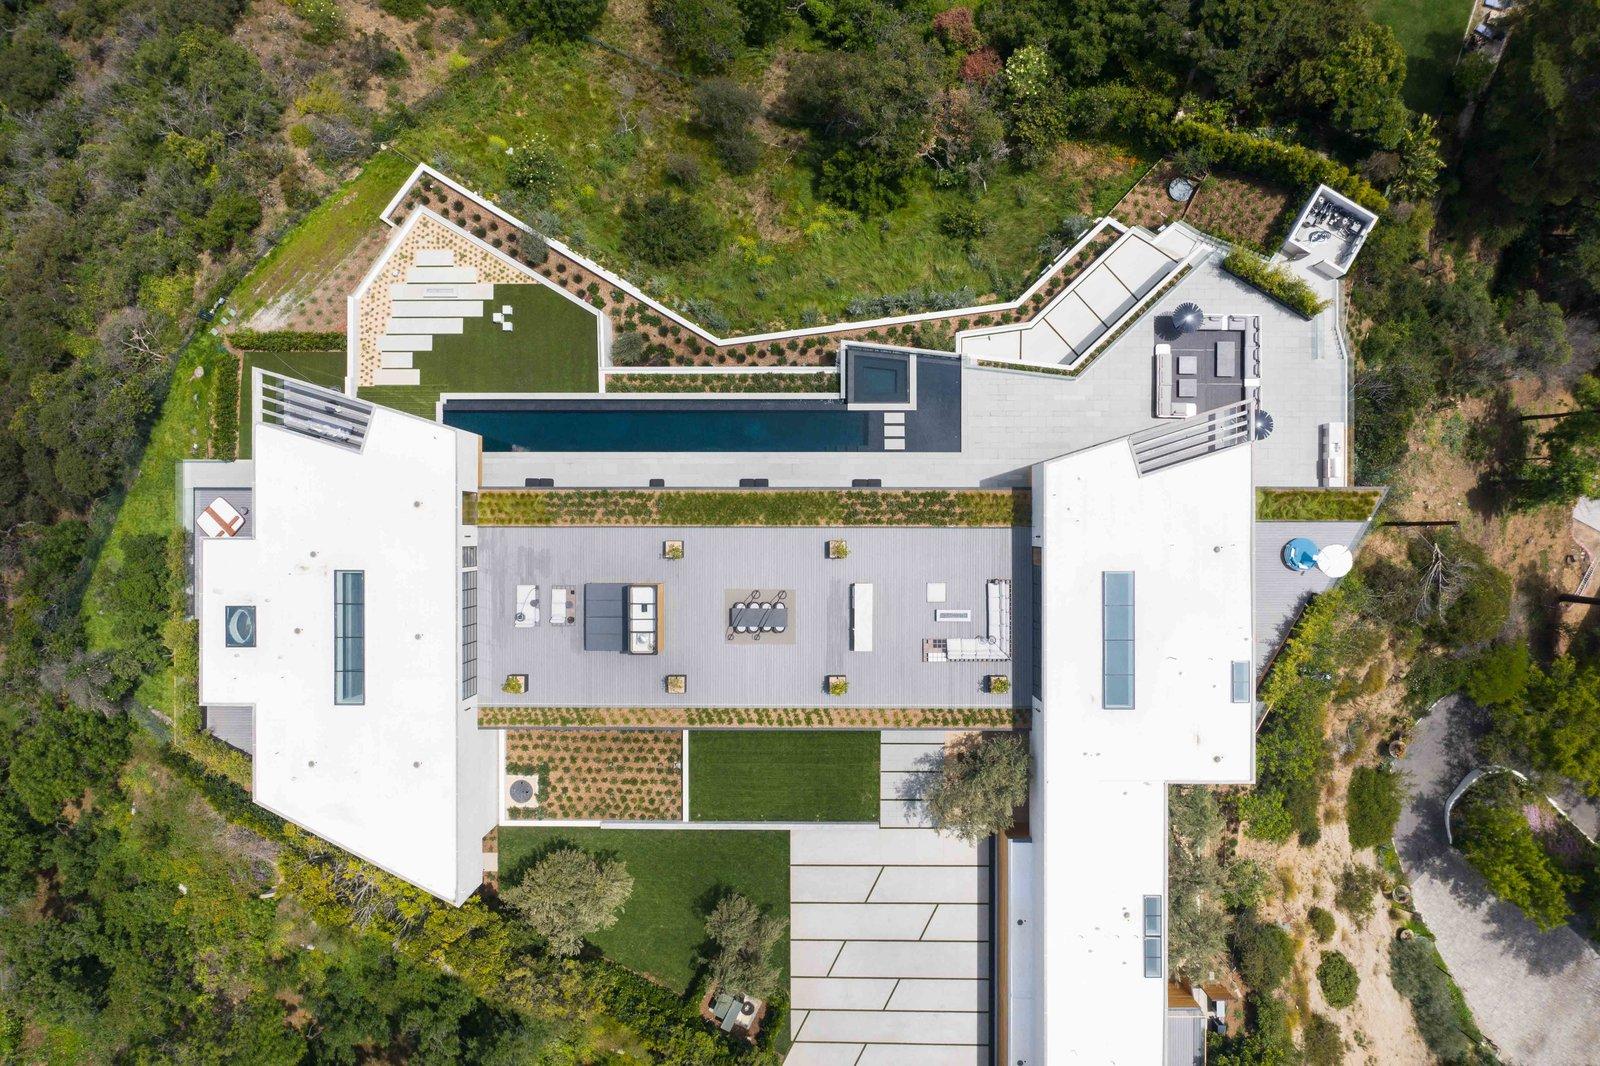 Carla House aerial view